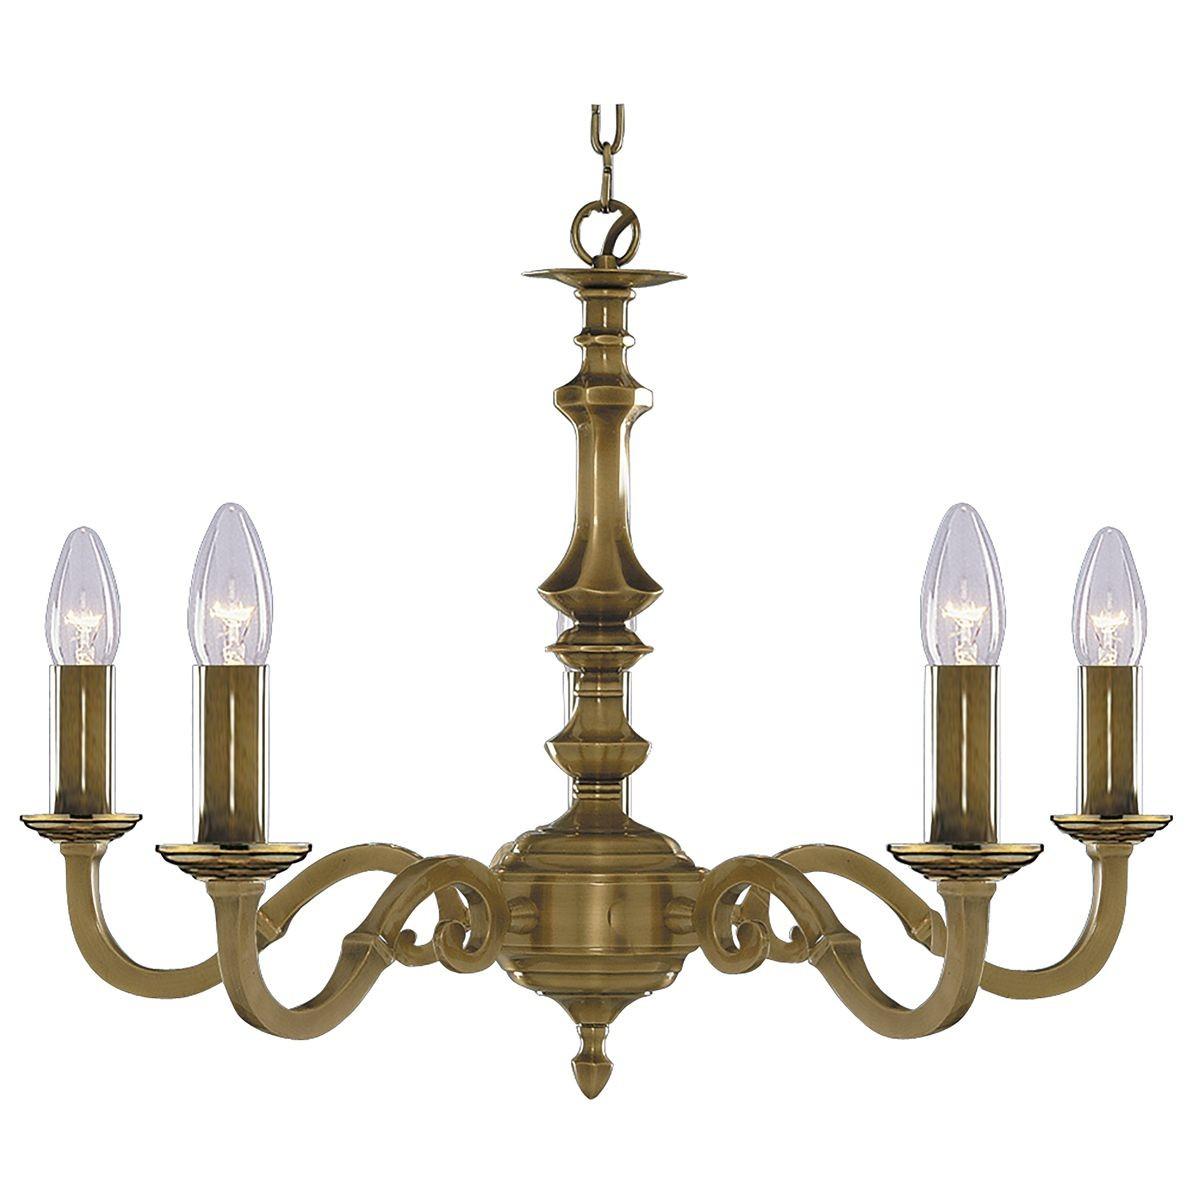 Malaga Ceiling Light 5 Arm Solid Brass